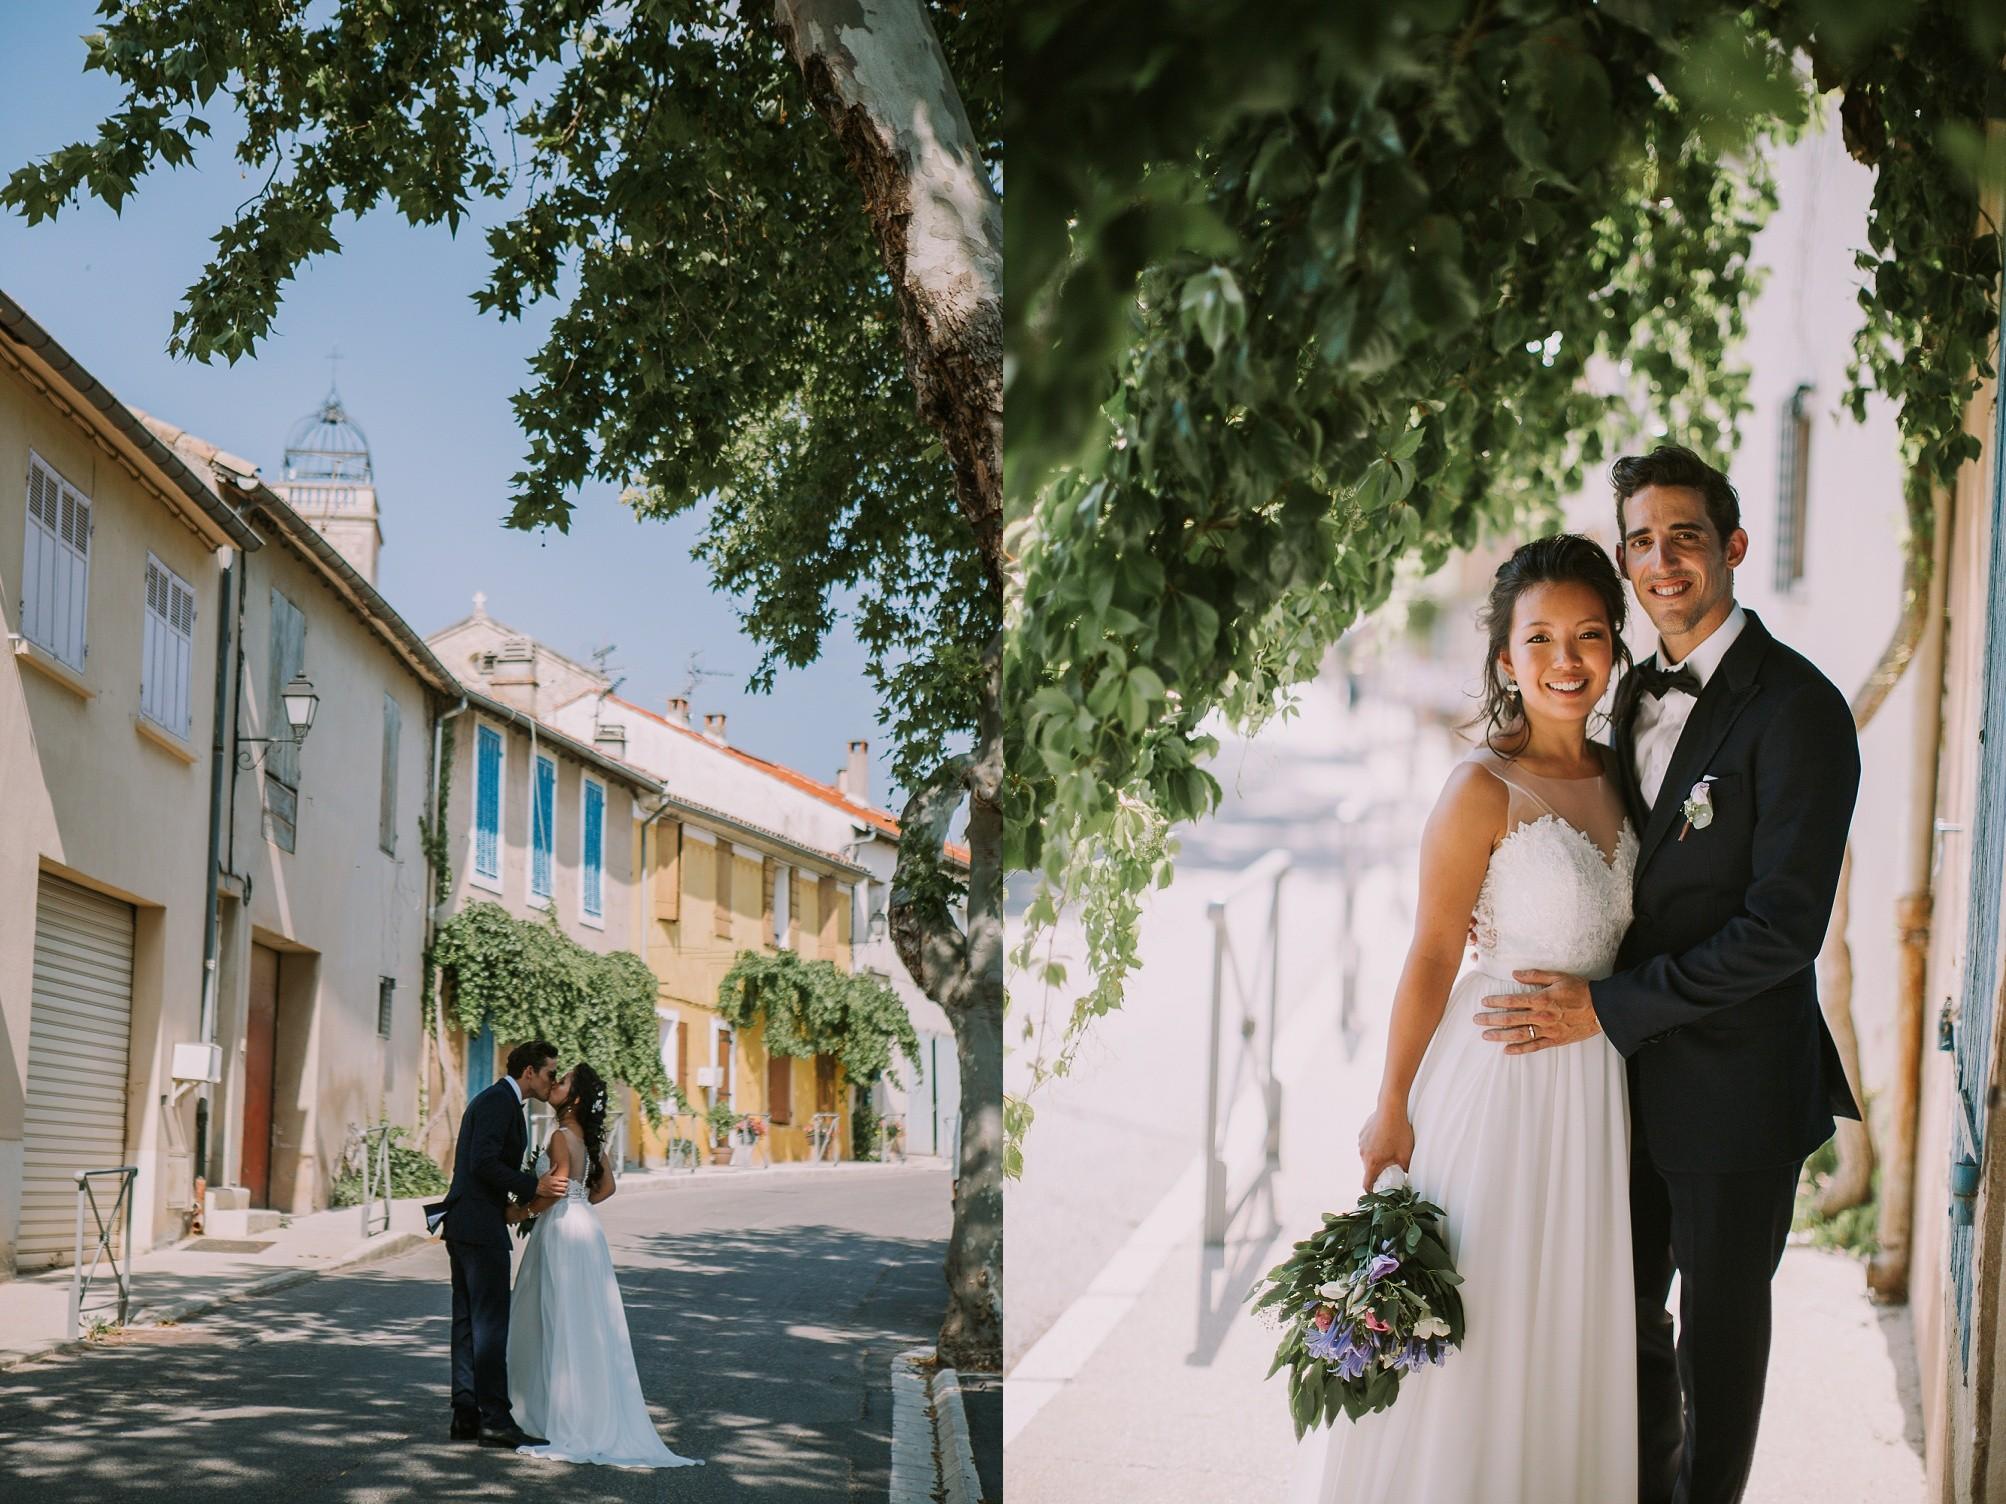 katerynaphotos-mariage-photographe-puyloubier-provence-aix-en-provence-sud-de-la-france_0379.jpg